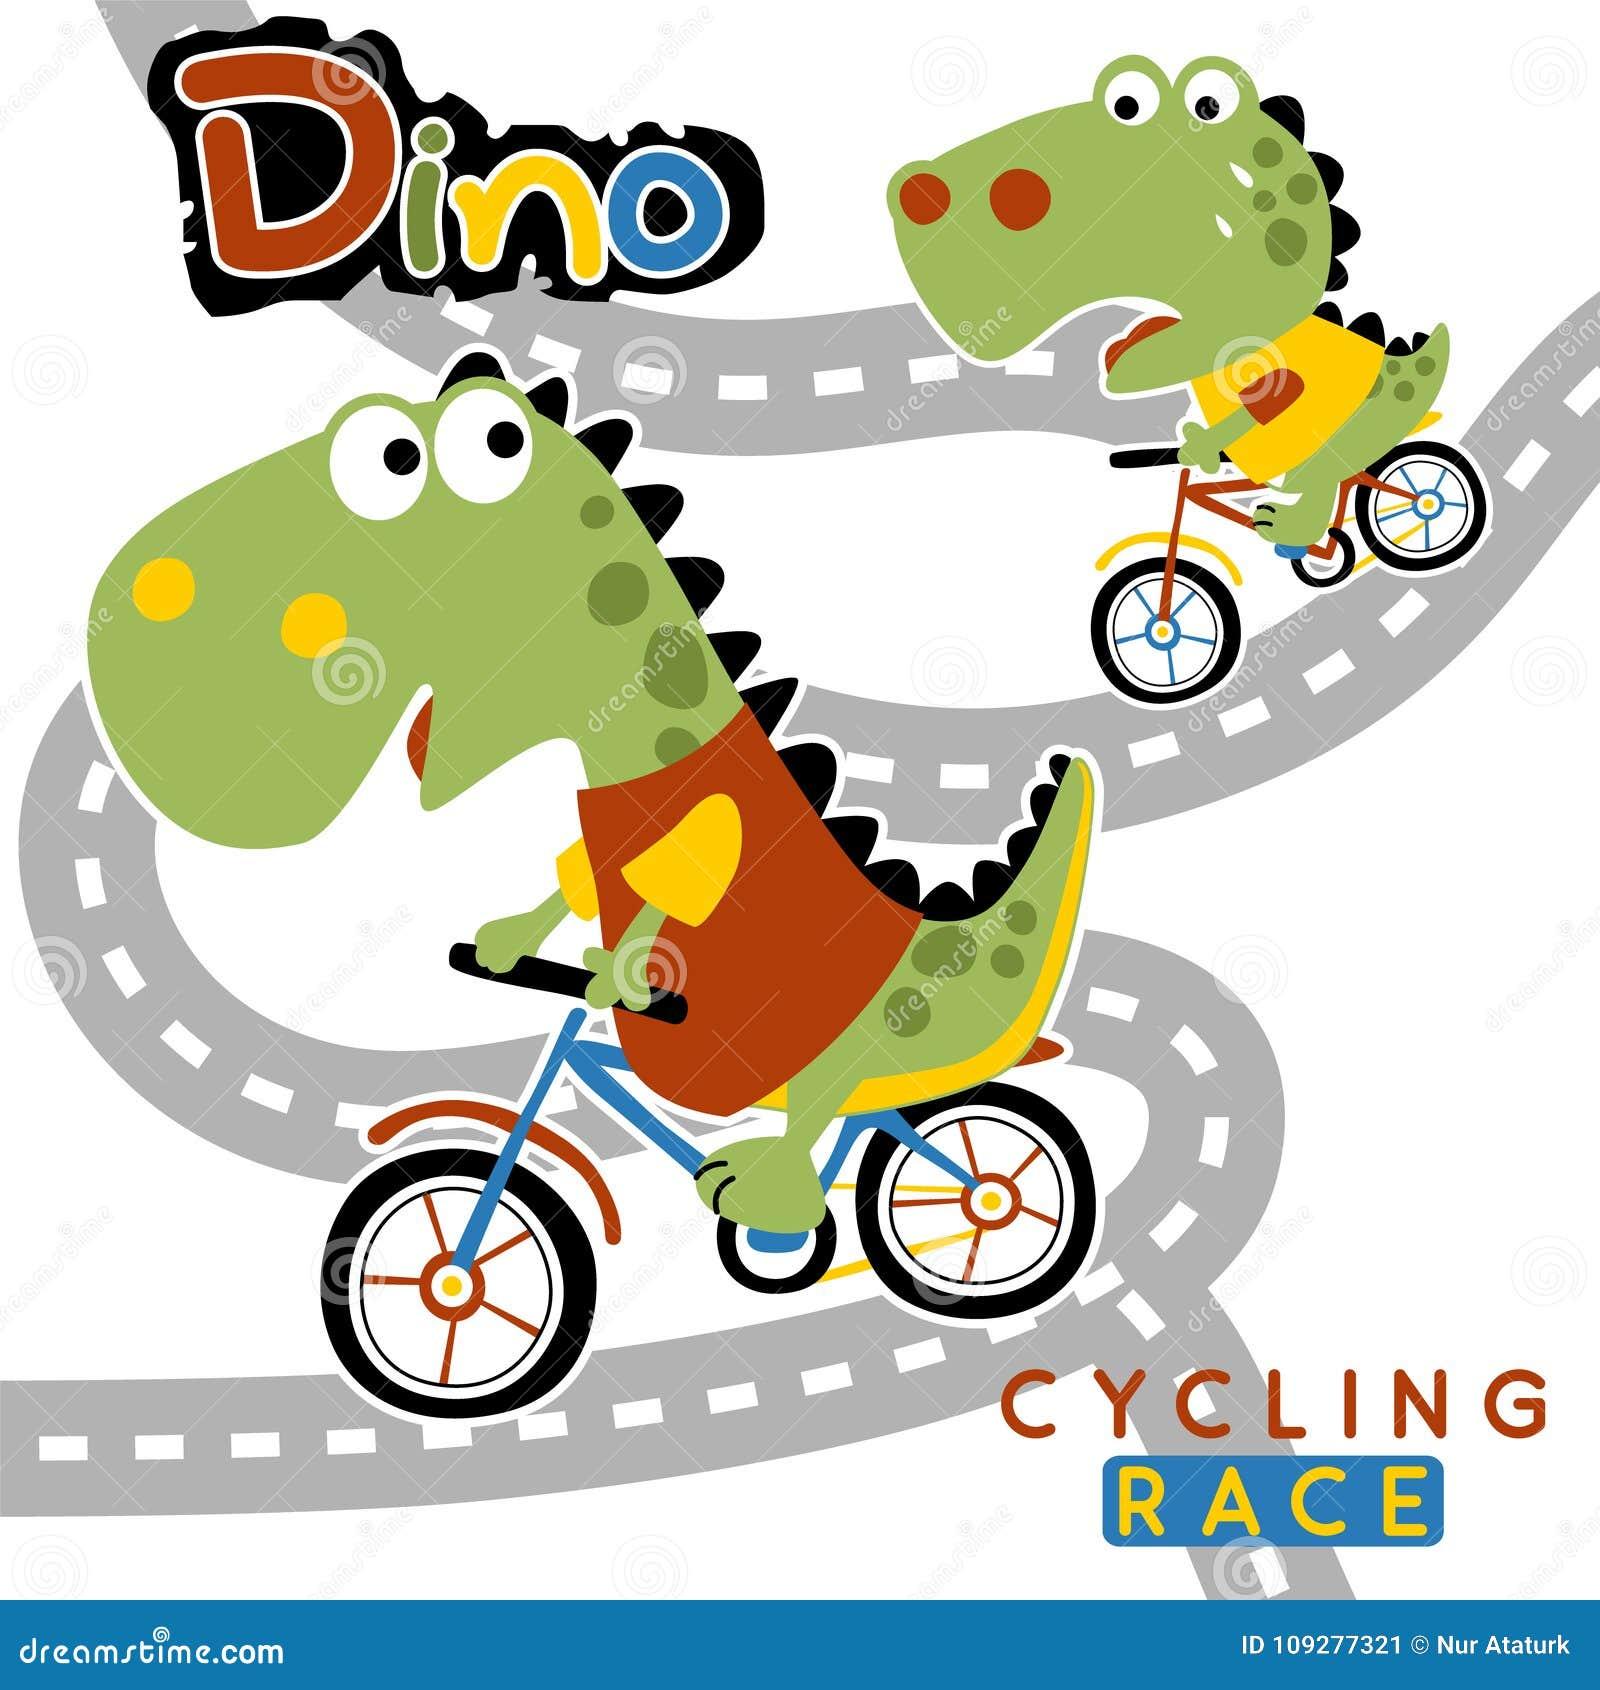 Bike racing cartoon on white background